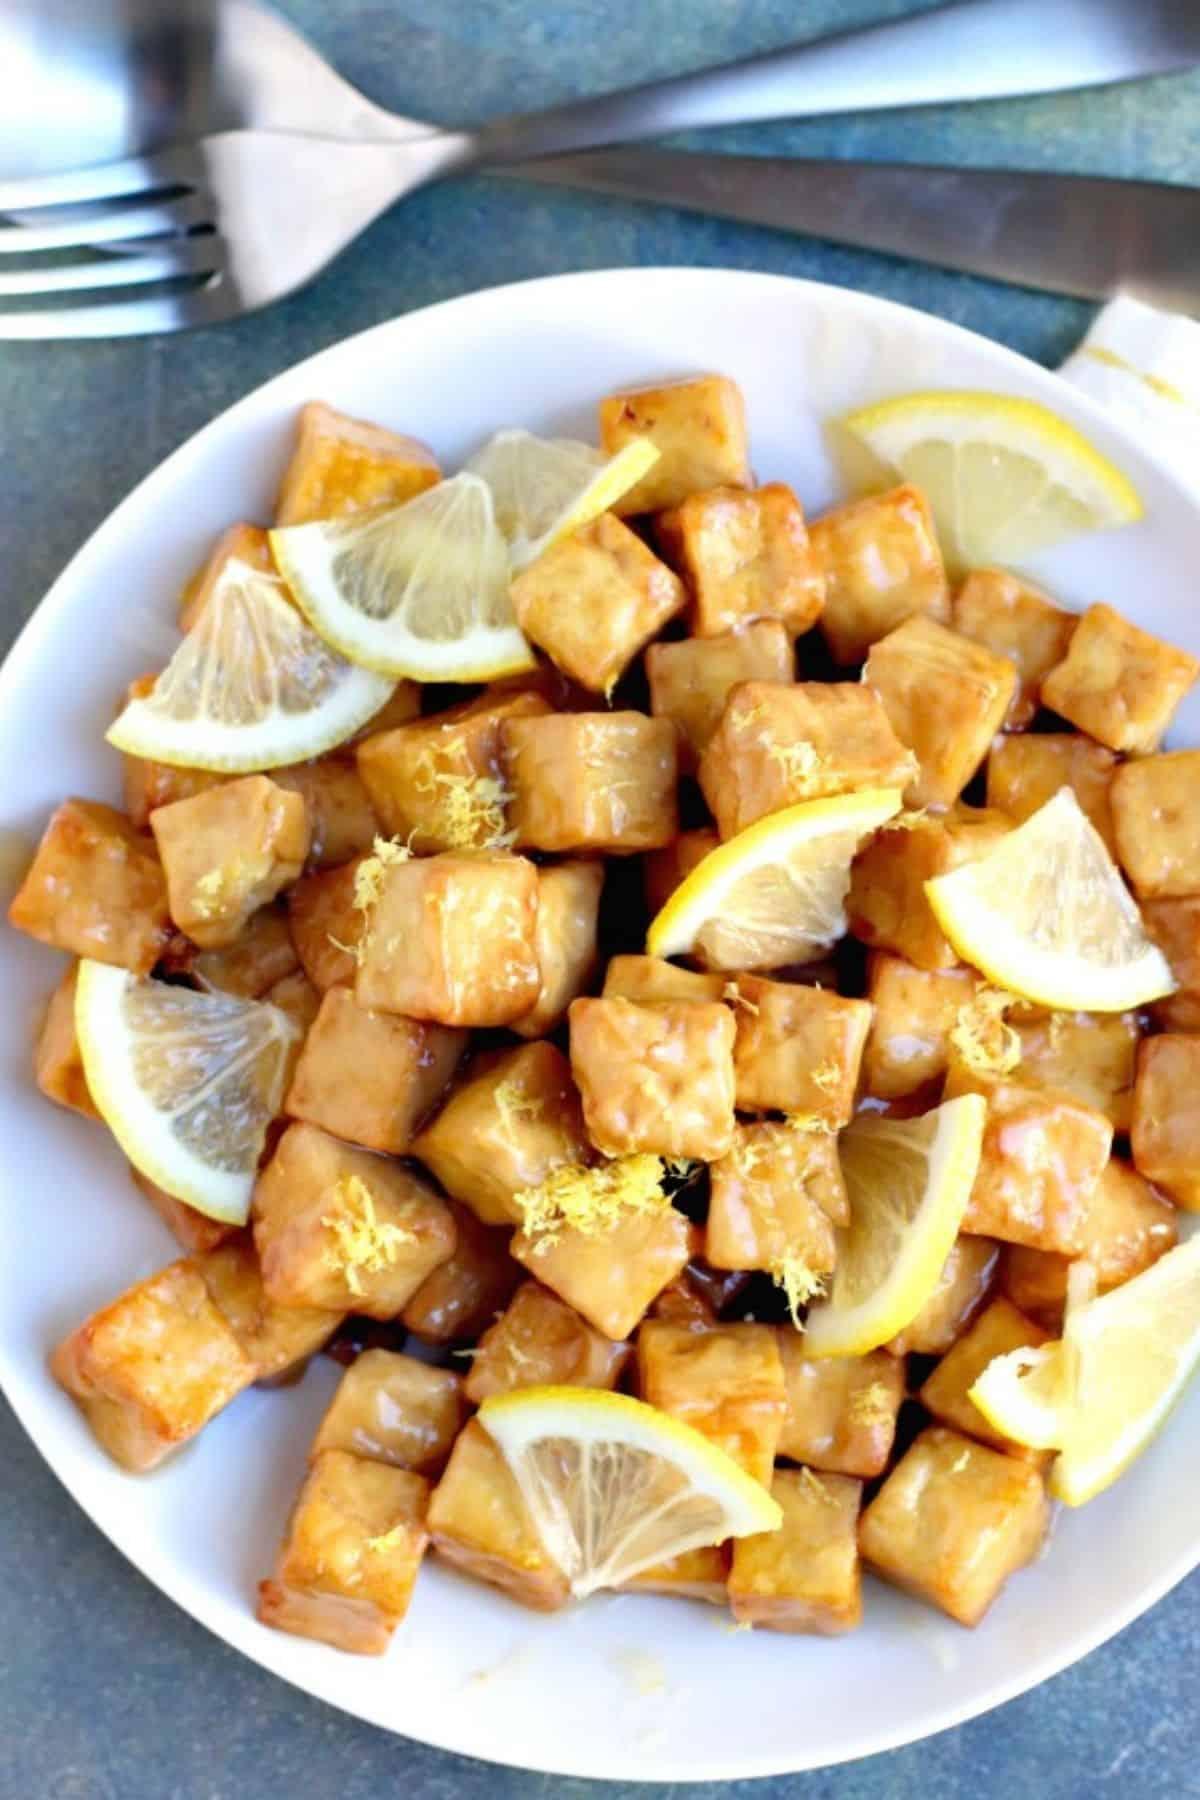 Platter of lemon tofu garnished with slices of fresh lemon